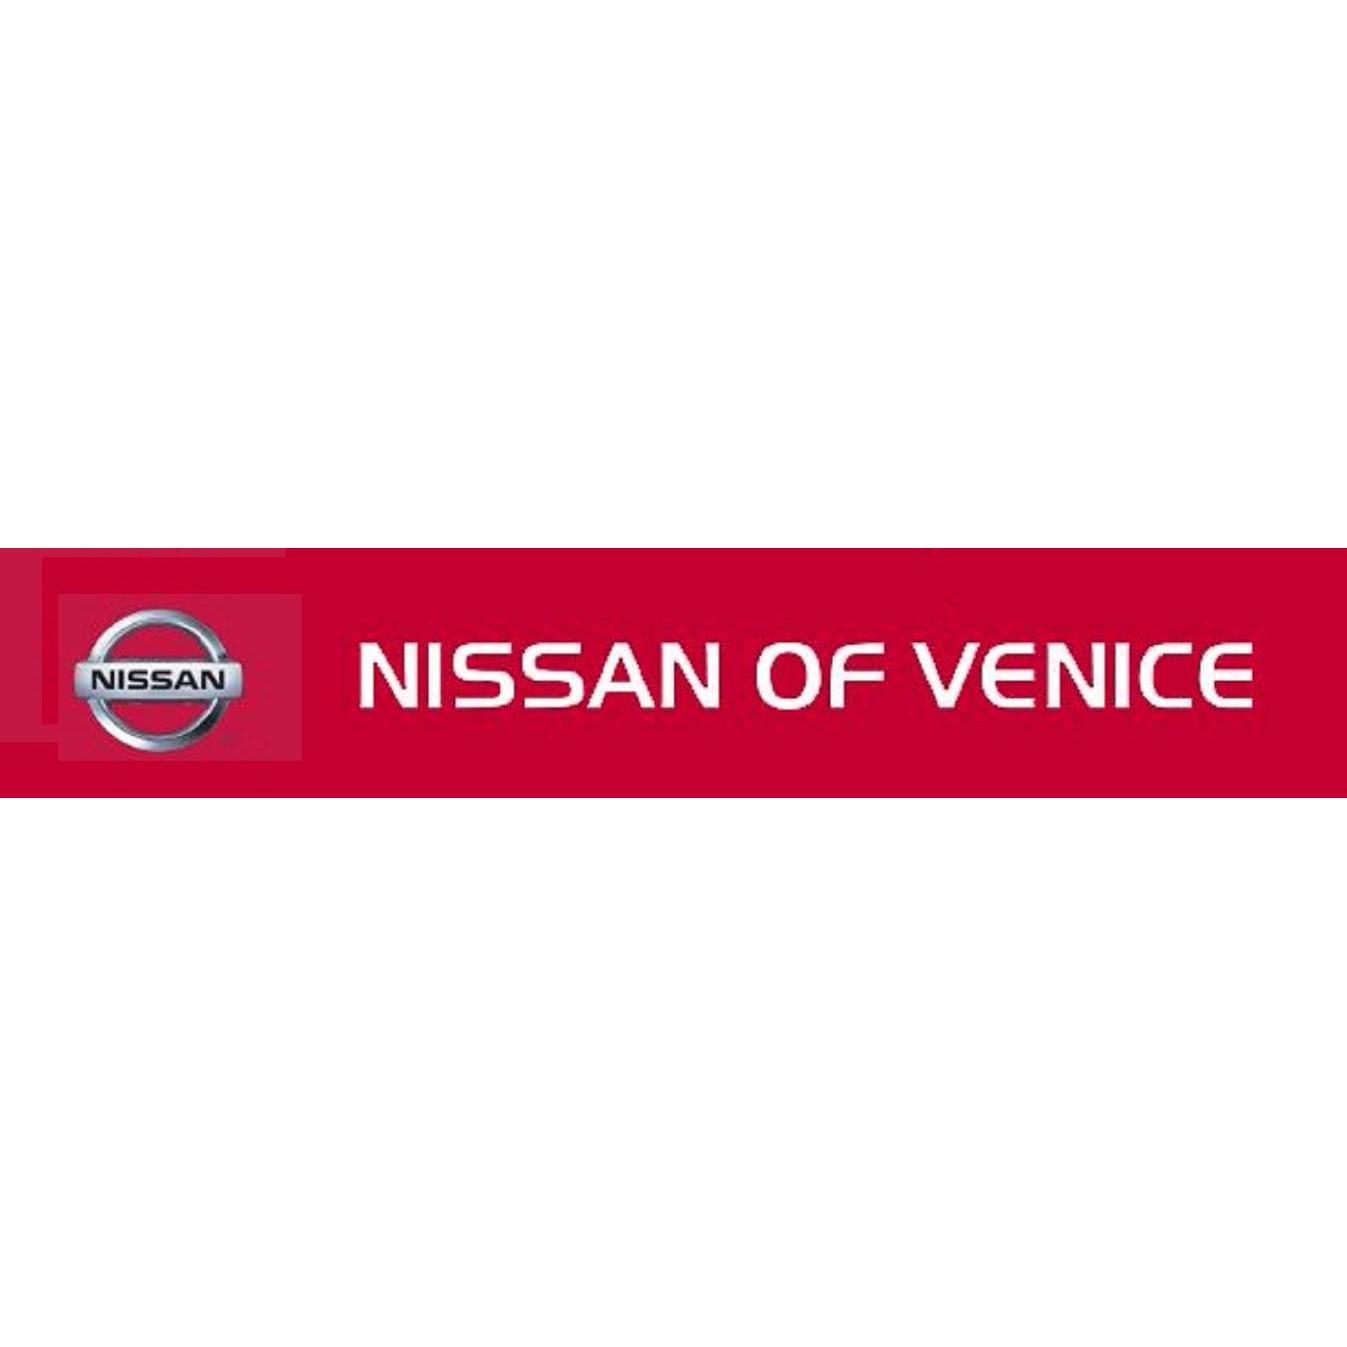 Nissan Of Venice